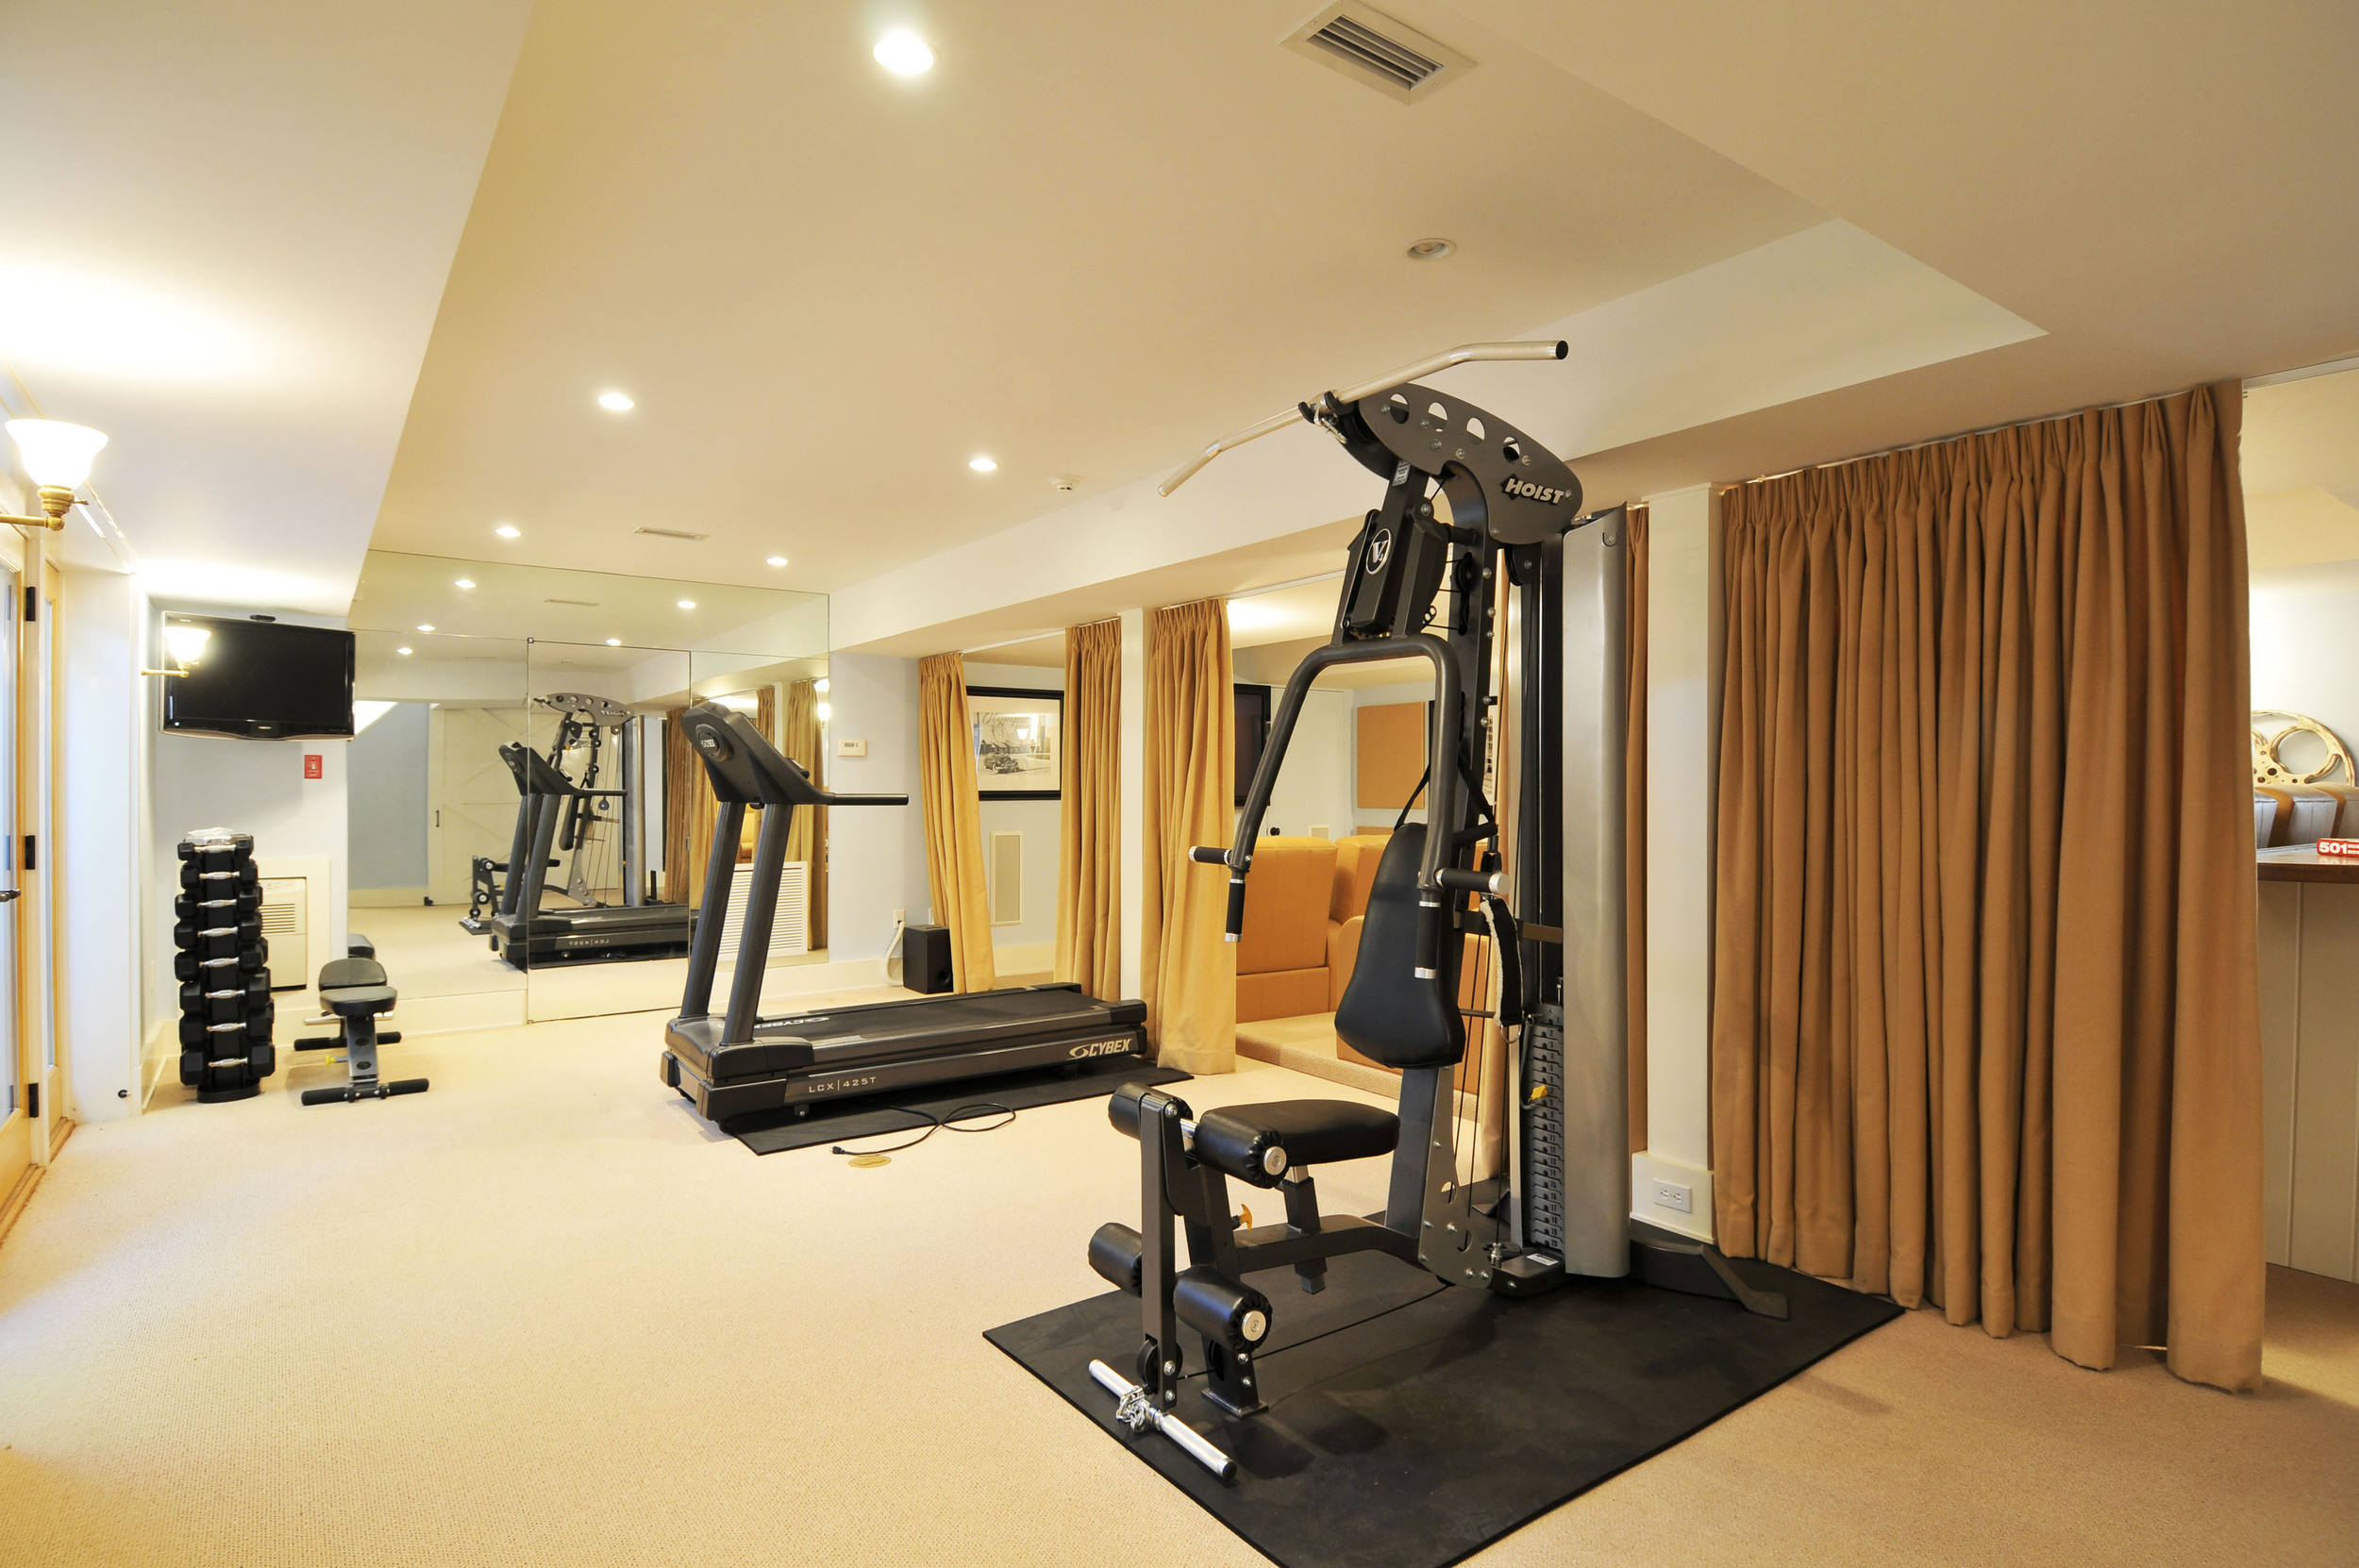 Barry#98008 gym.jpg